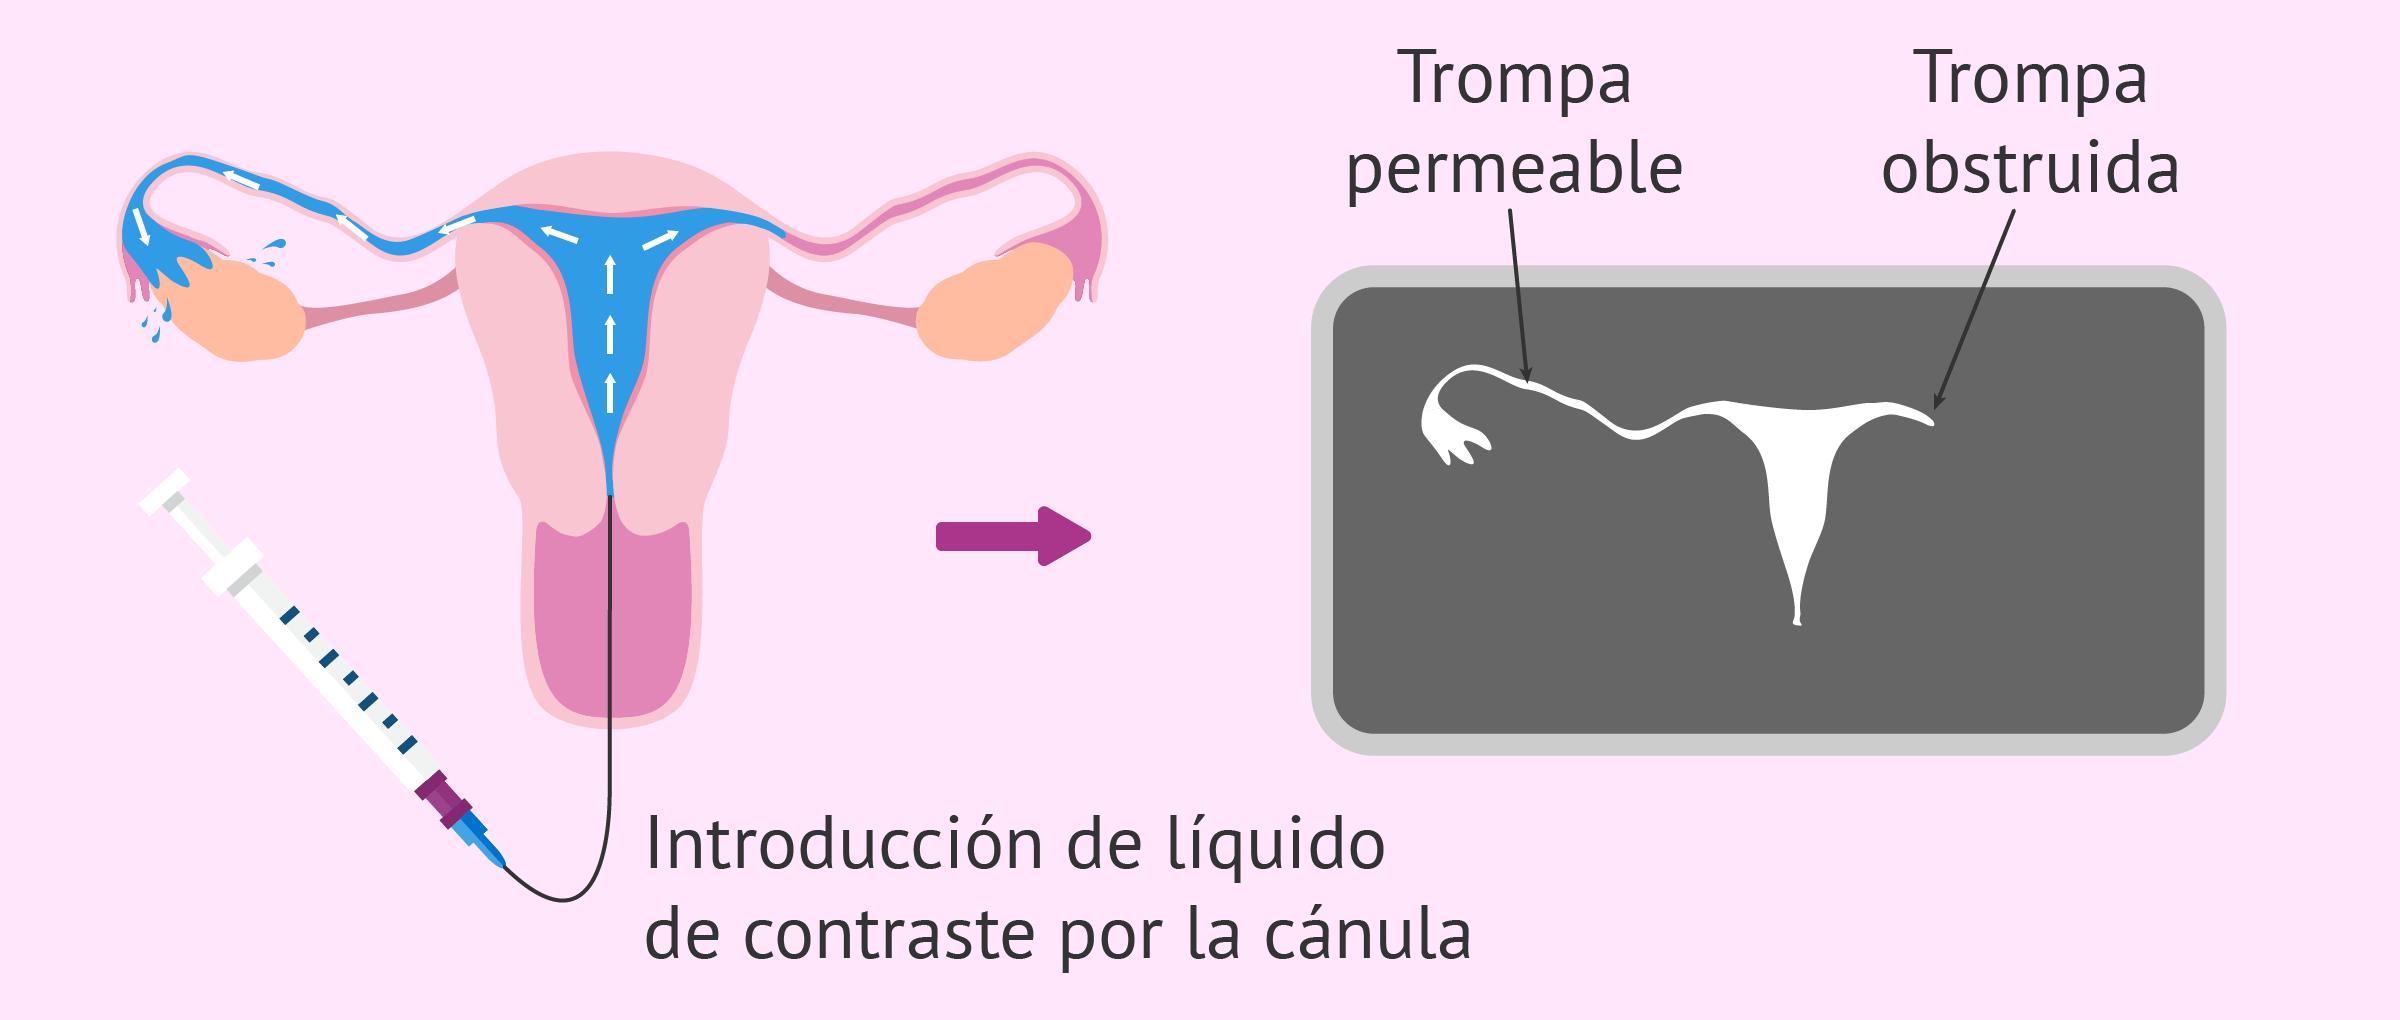 Histerosalpingografía